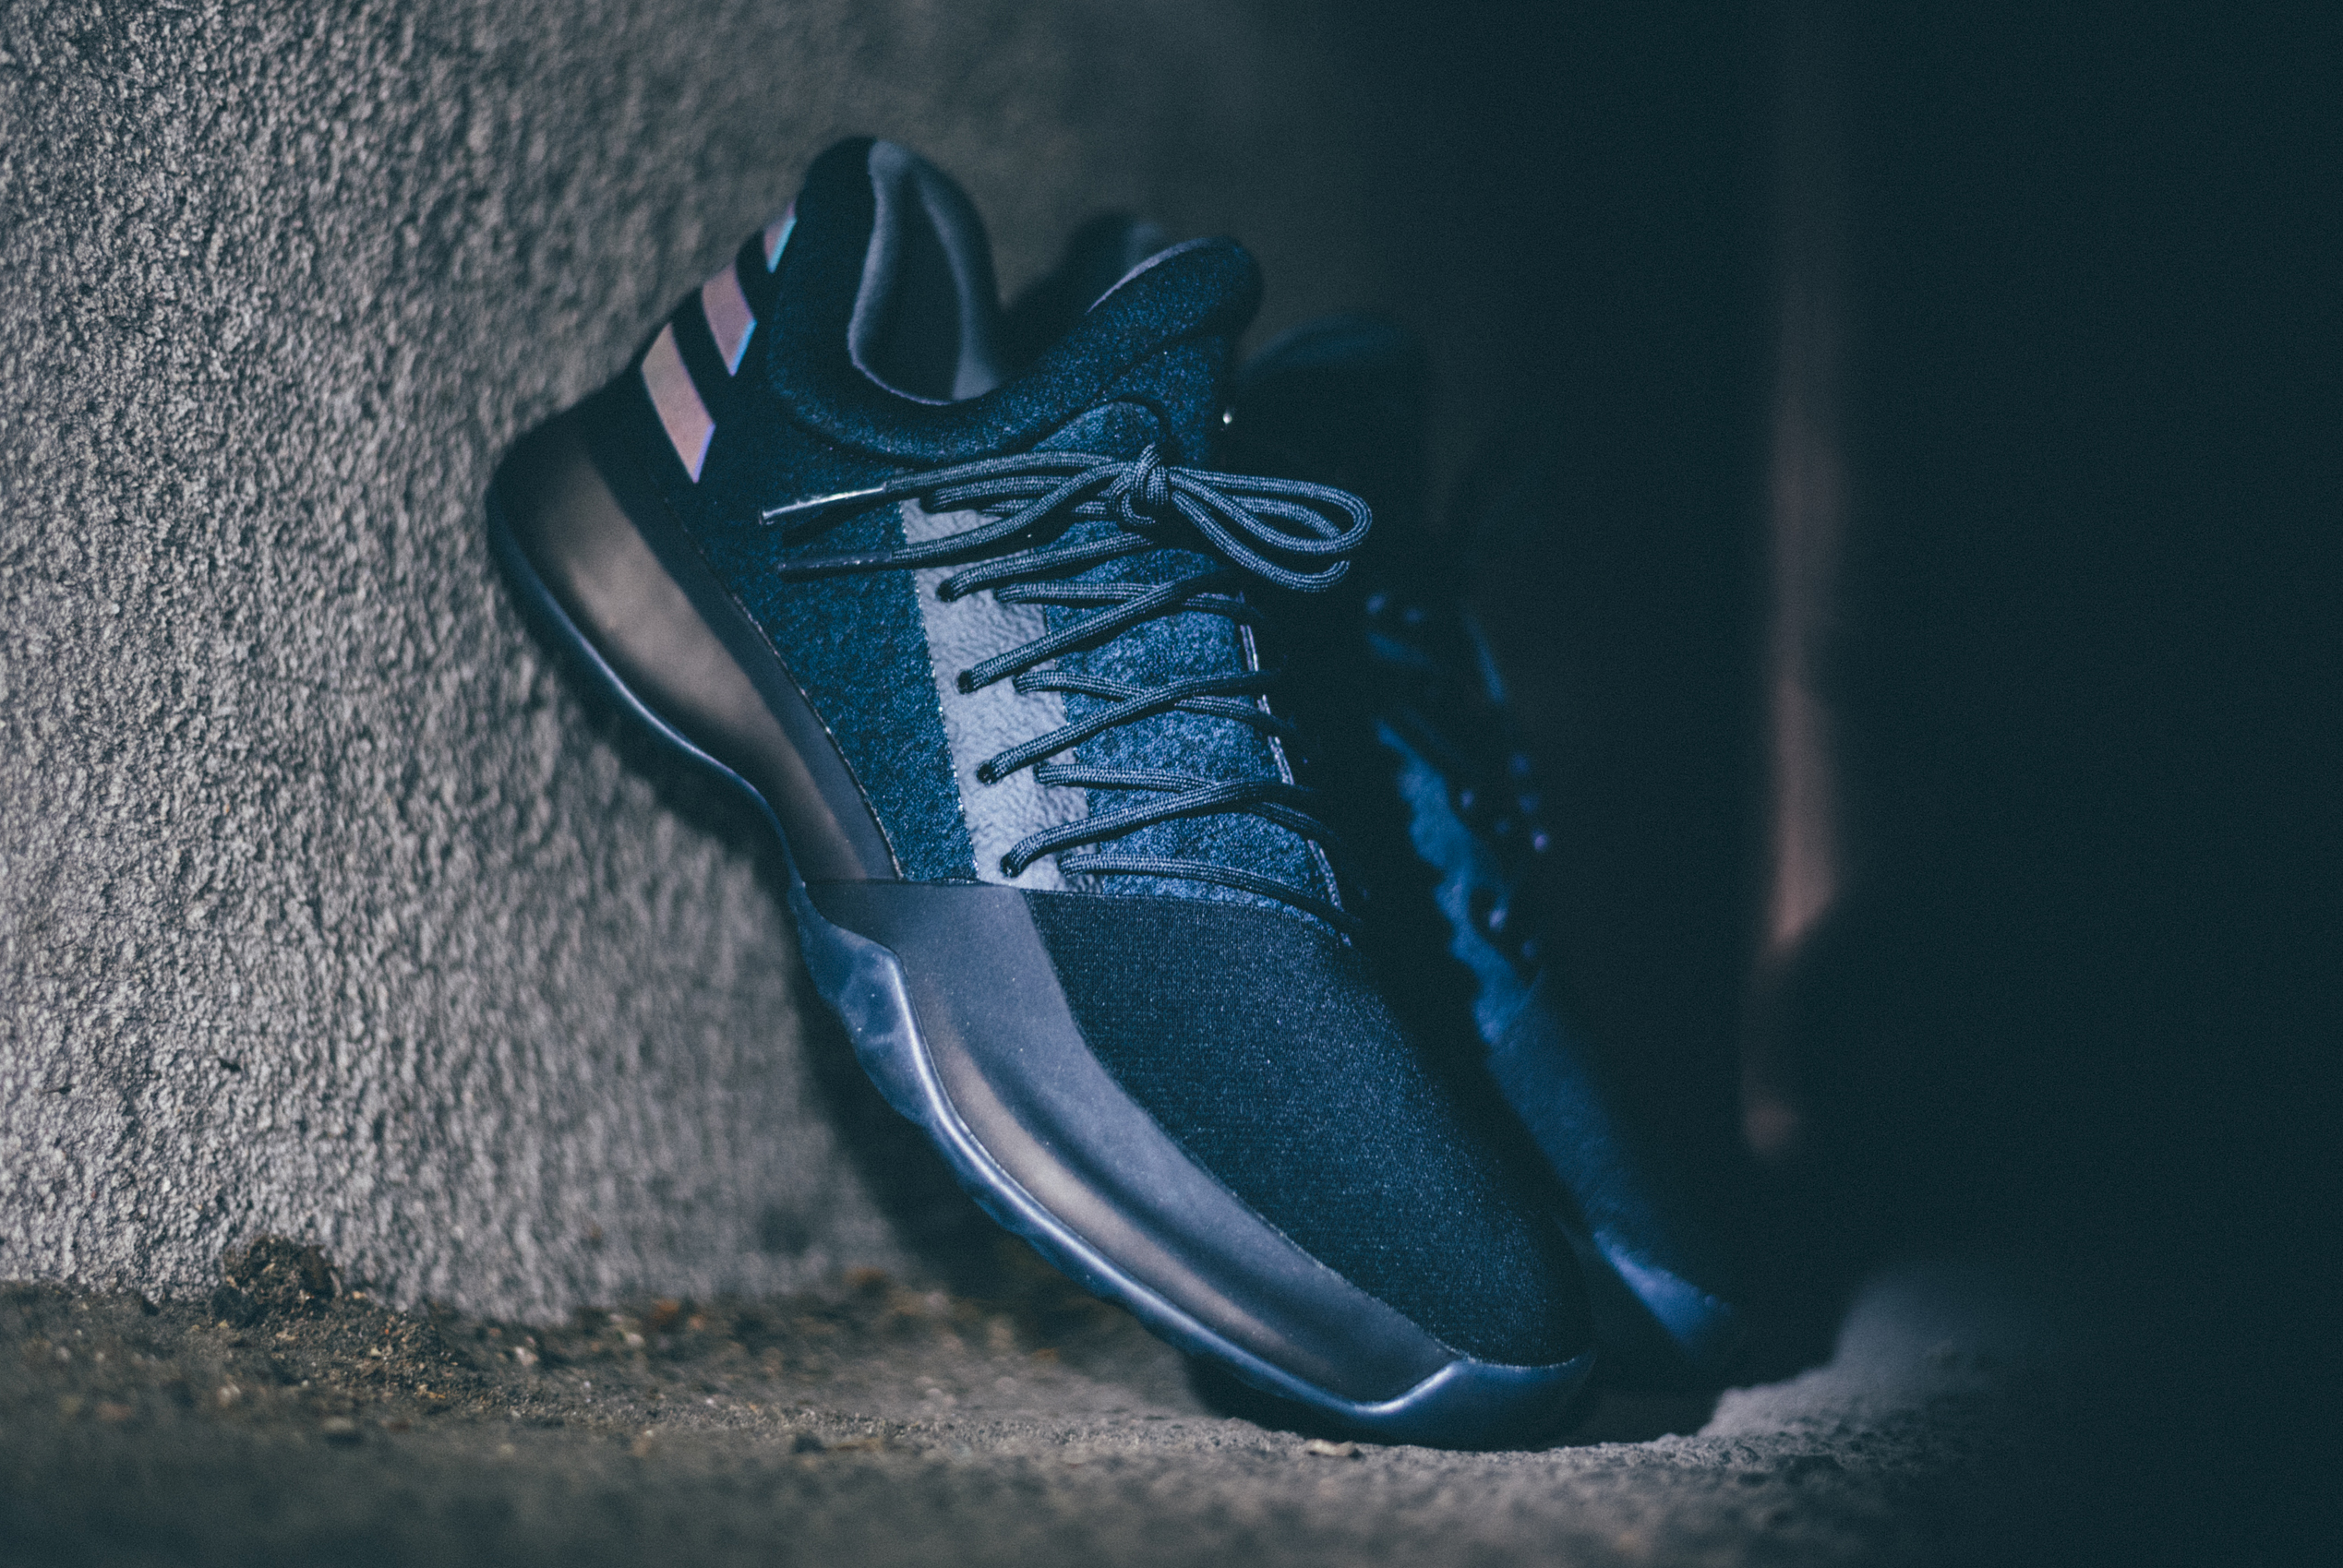 Adidas Harden Vol 1 Triple Black Dark Ops Xeno 2